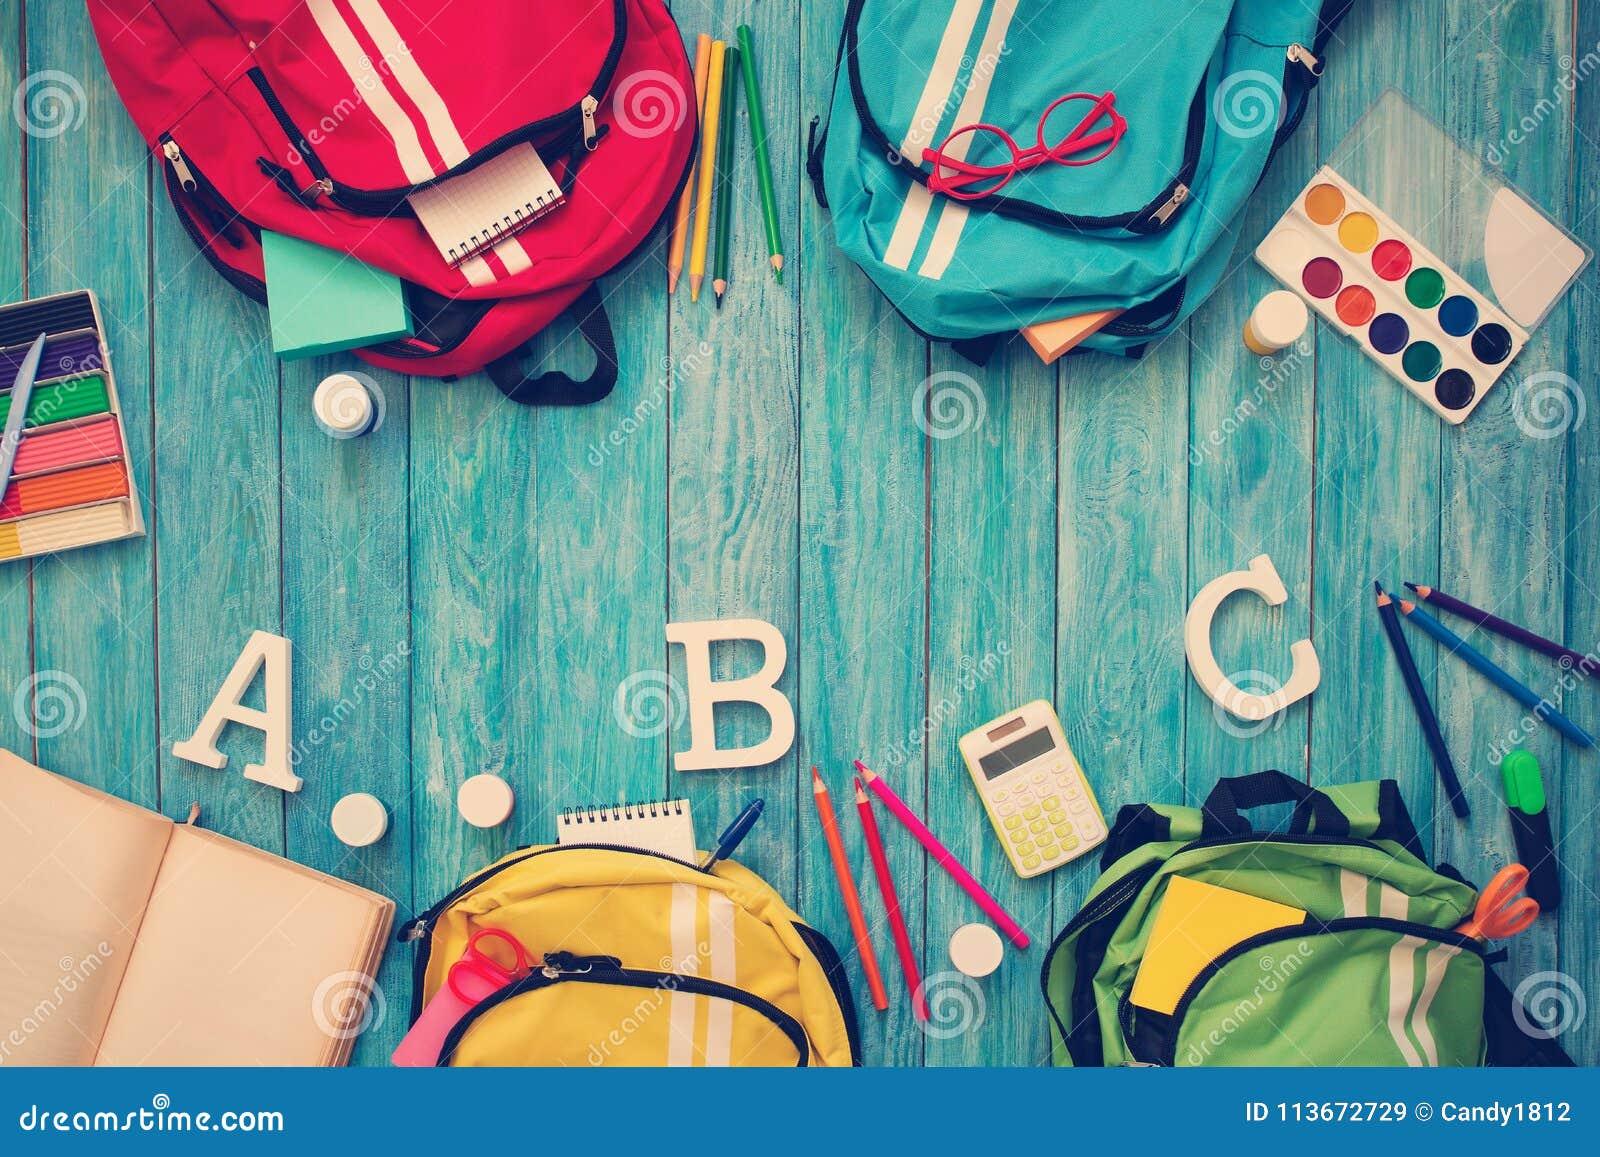 ea474544c92 Ζωηρόχρωμες σχολικές τσάντες παιδιών στο ξύλινο πάτωμα Σακίδια πλάτης με τα  σχολικά εξαρτήματα